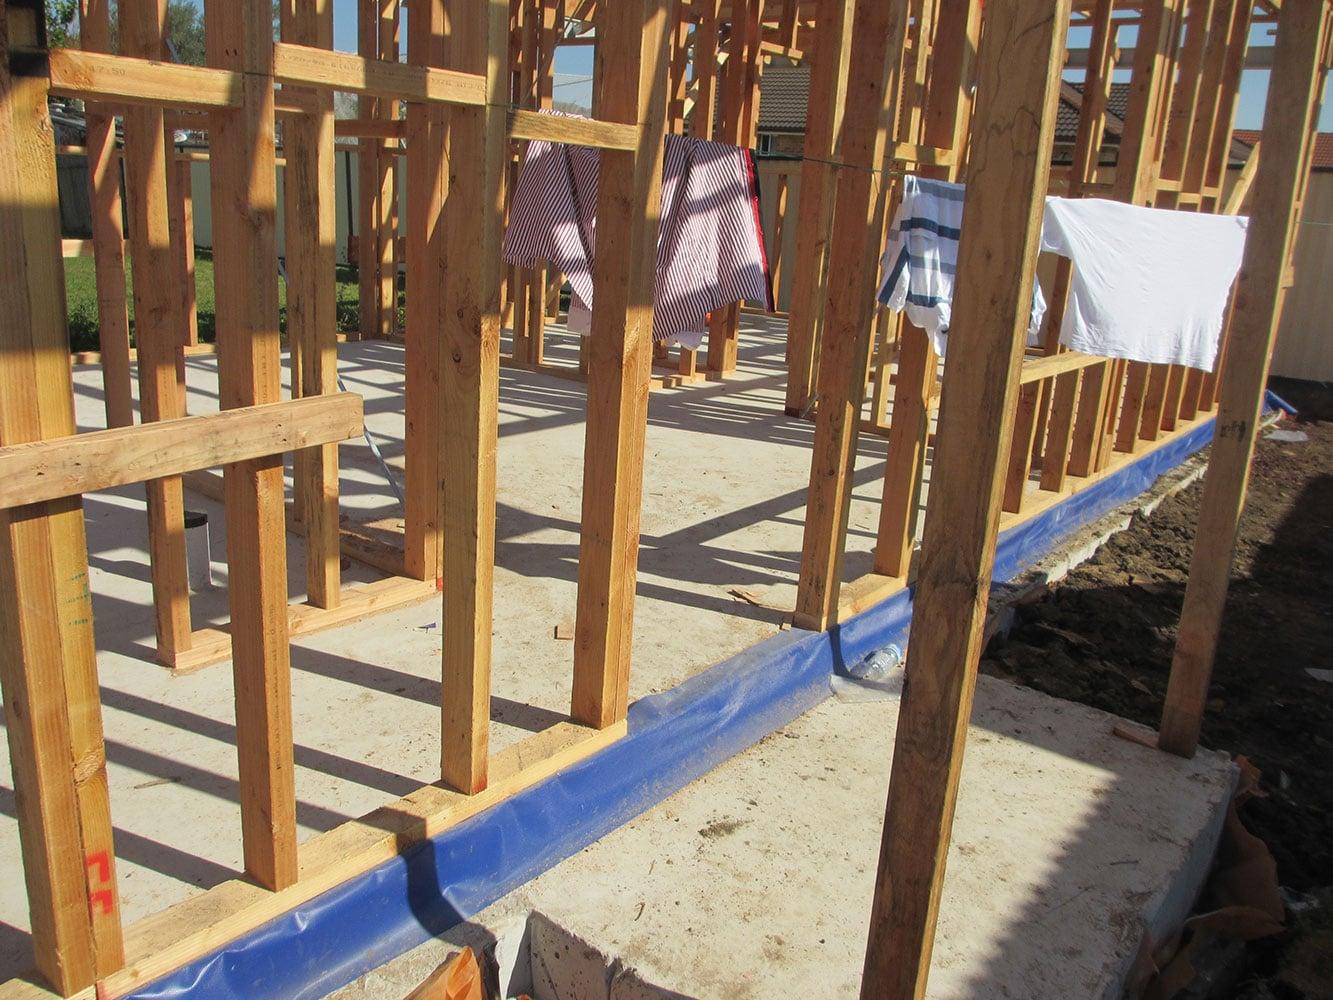 Recessed Concrete porch area As Per BCA. Size 1.4 x 1m